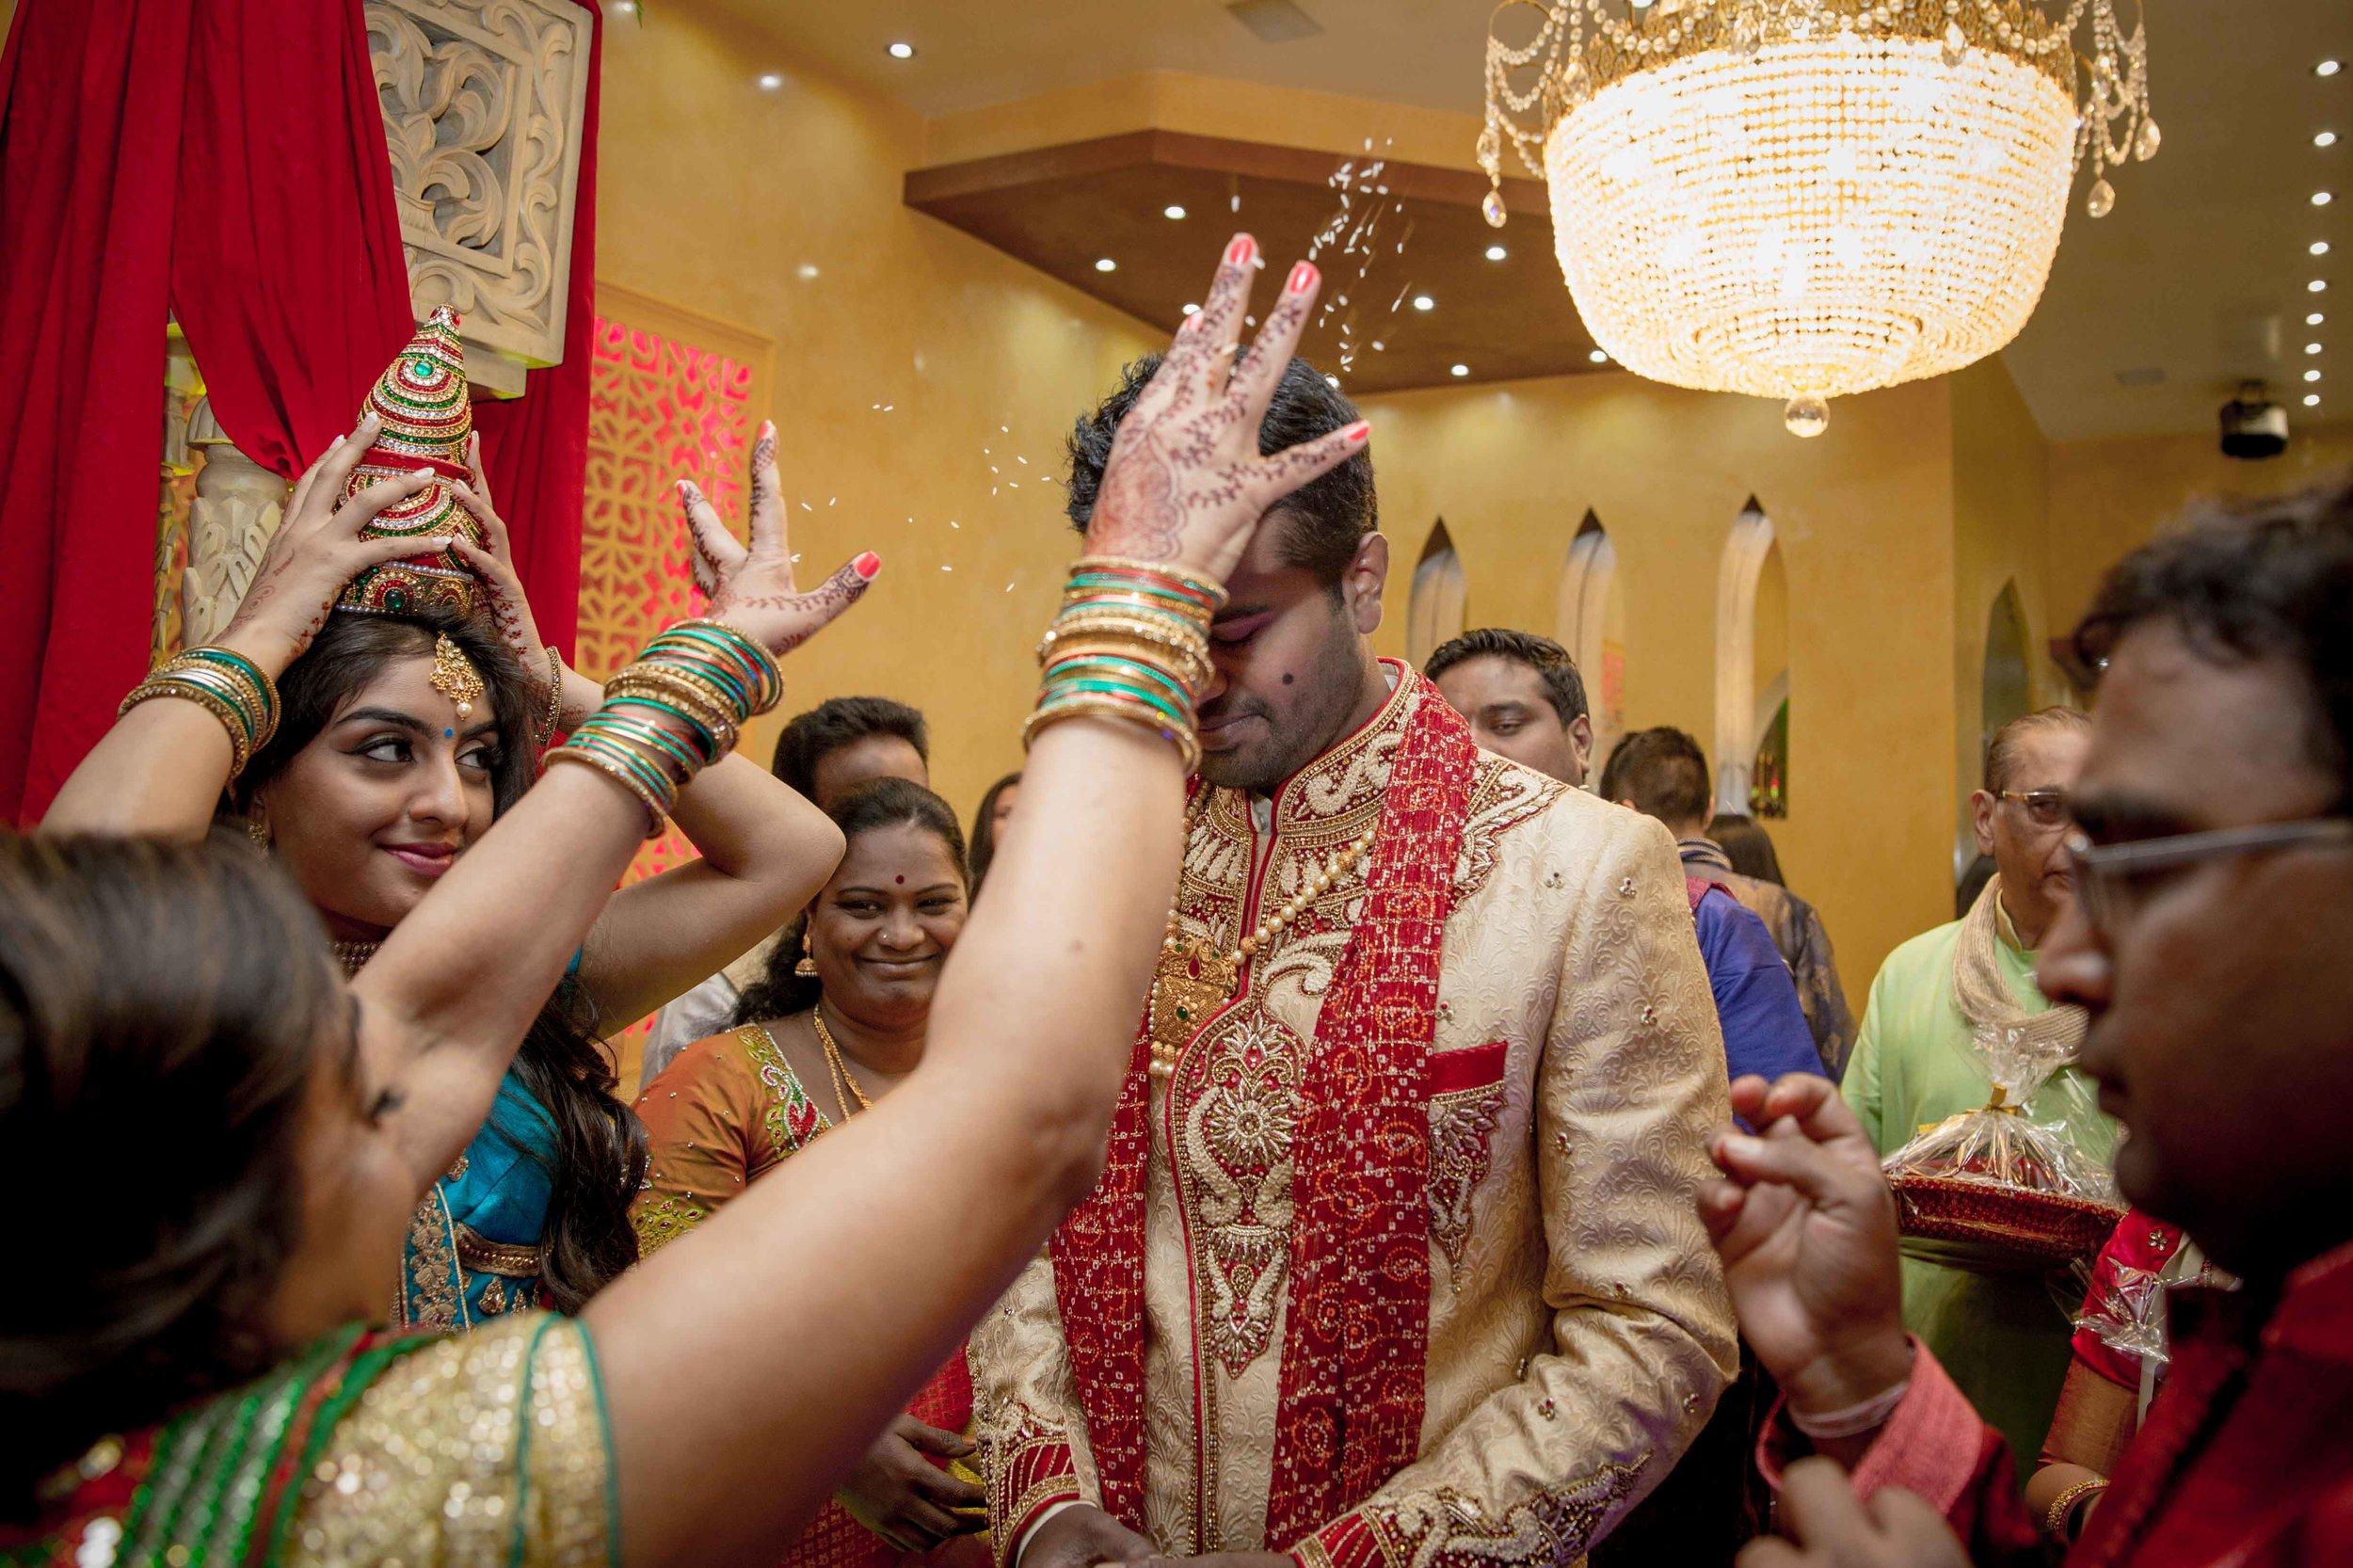 premier-banquetting-london-Hindu-asian-wedding-photographer-natalia-smith-photography-9.jpg